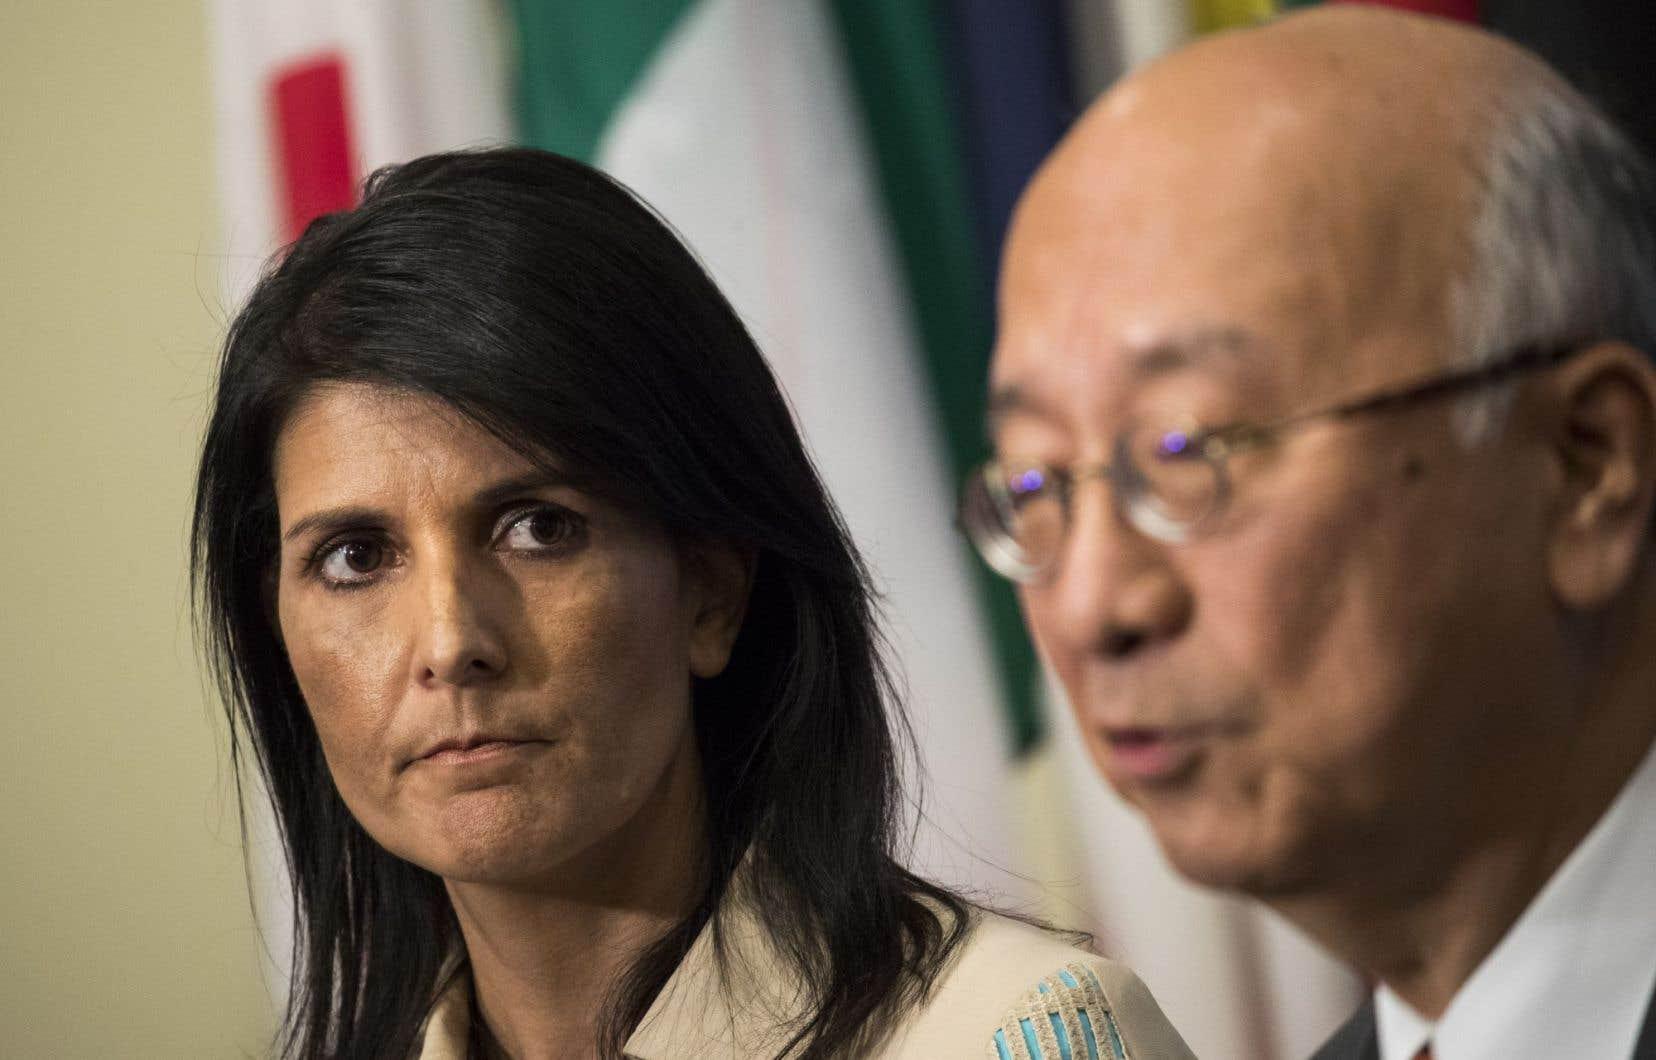 L'ambassadrice américaine aux Nations unies Nikki Haley